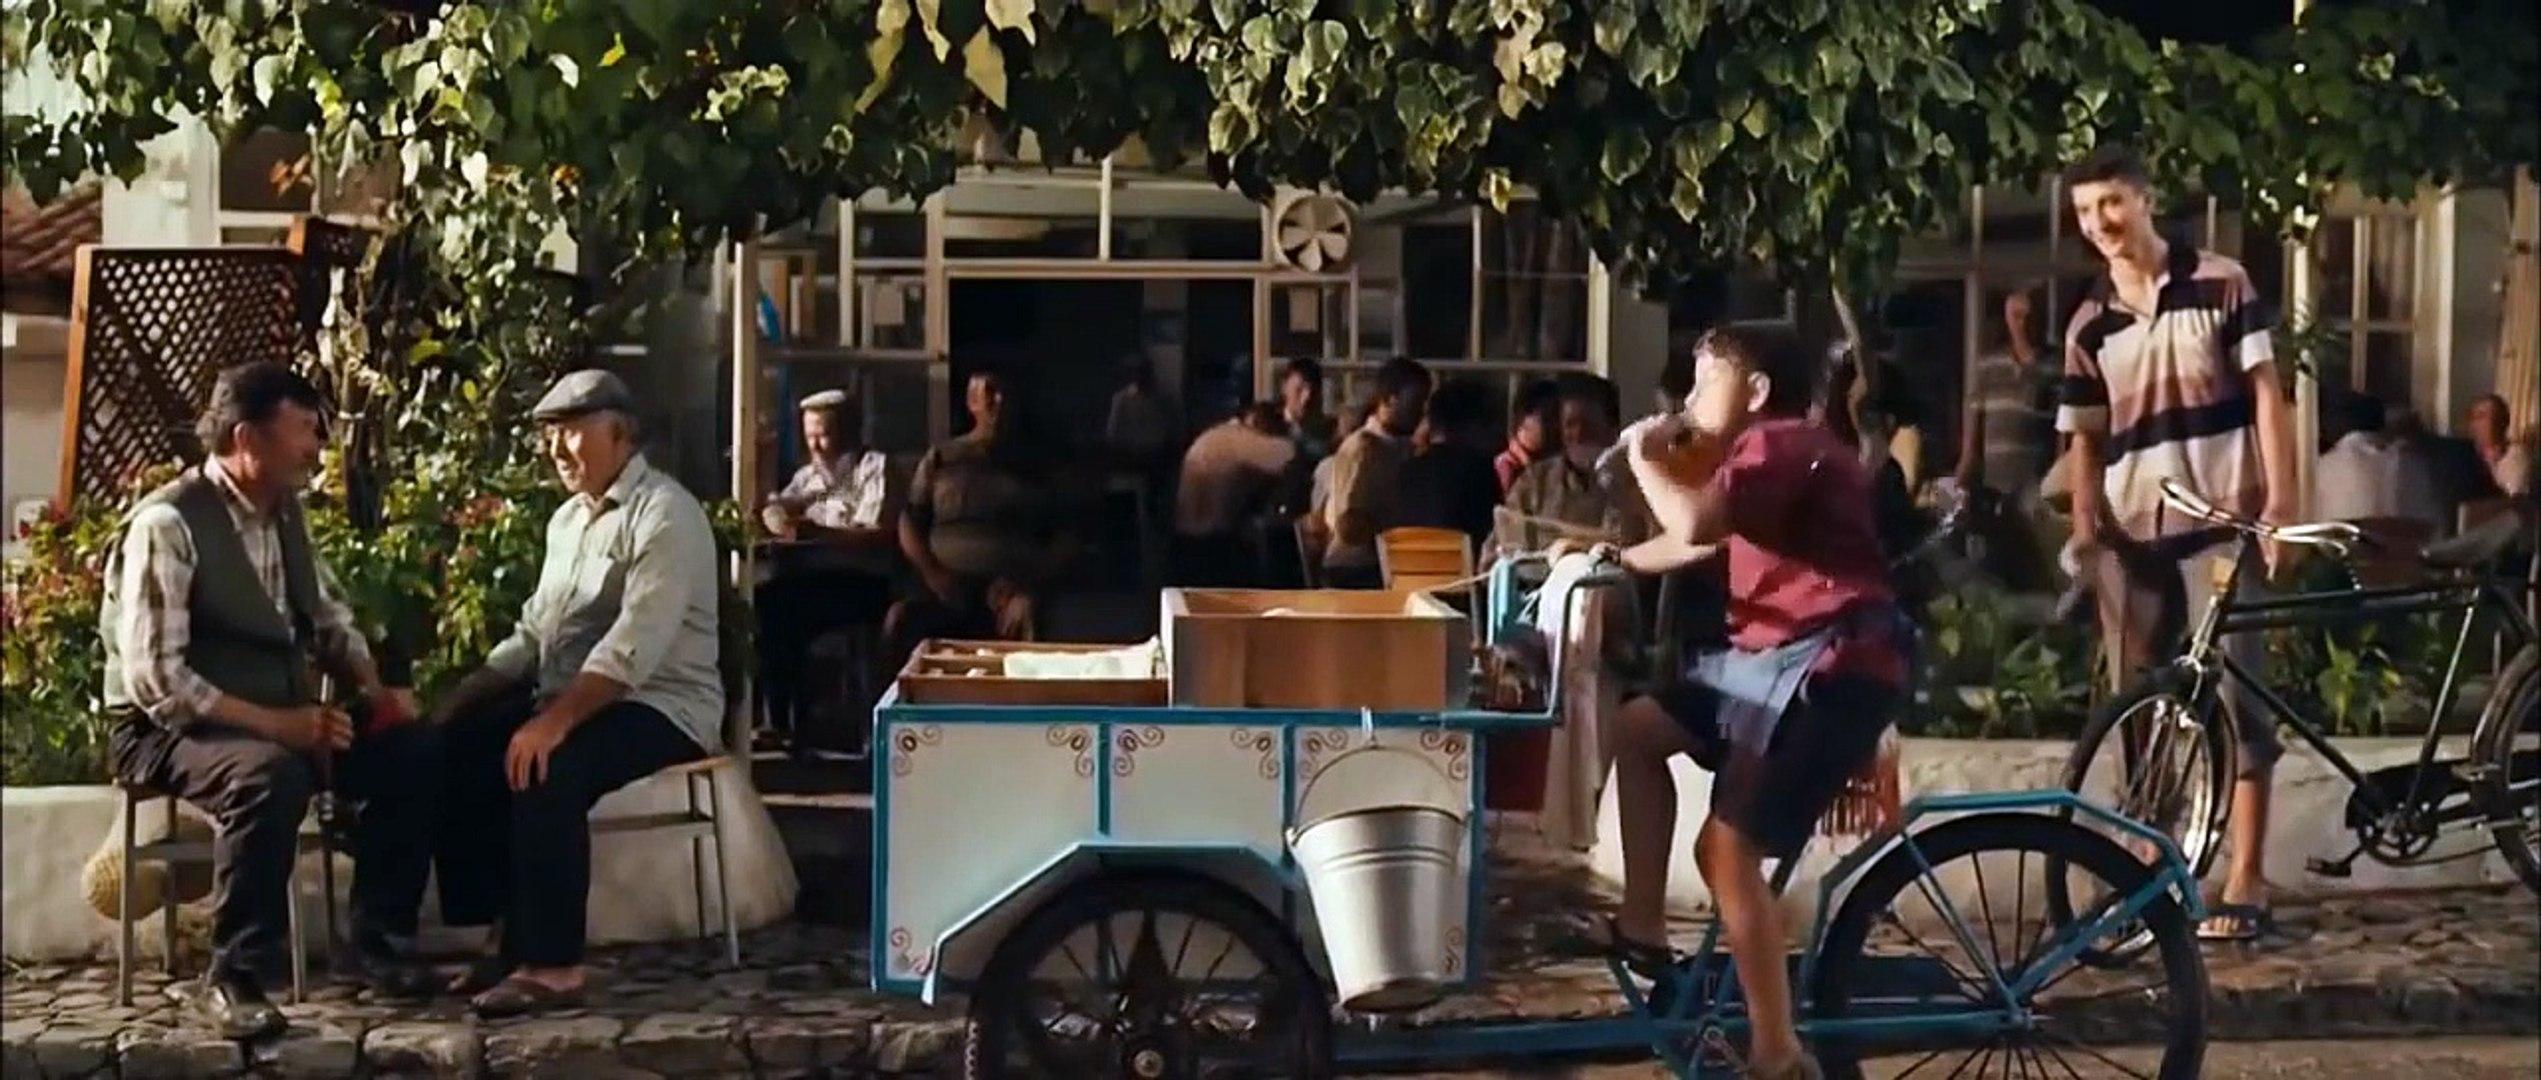 İftarlık Gazoz | Yerli Film (2016 HD) Cem Yılmaz Filmi part 1/2